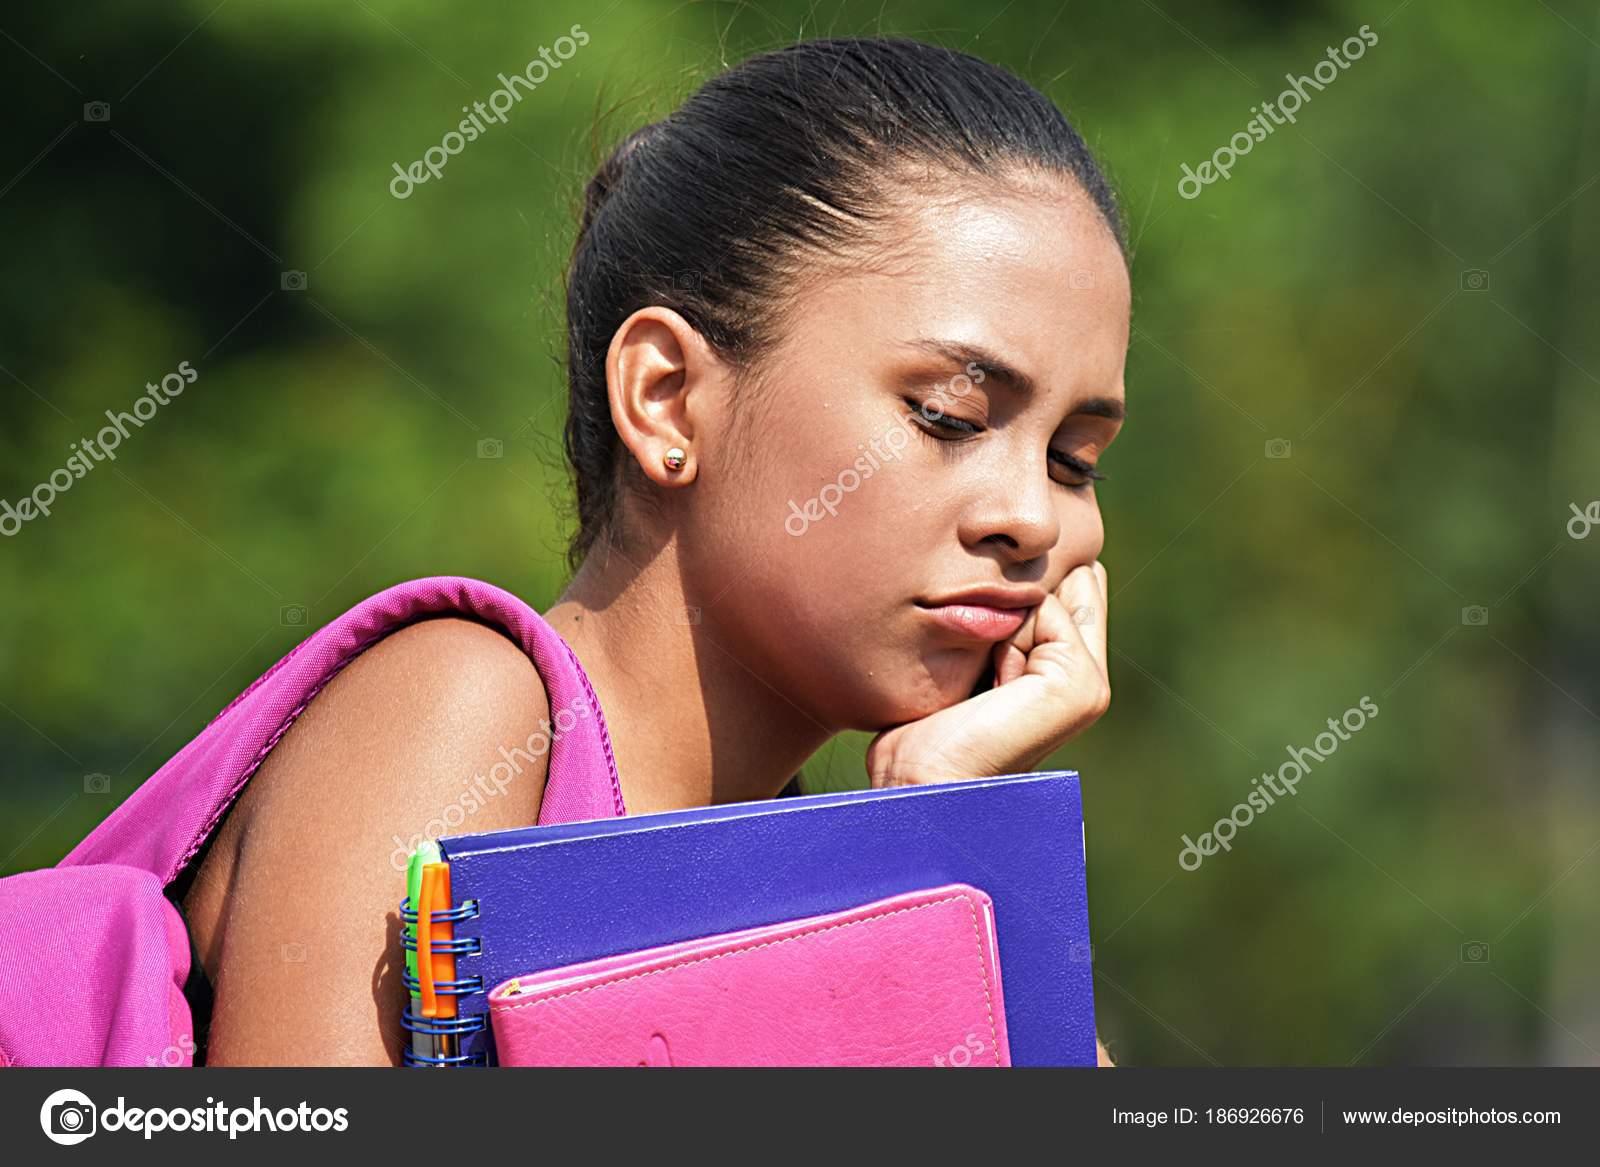 Hispanic Teenager School Girl Decision Making